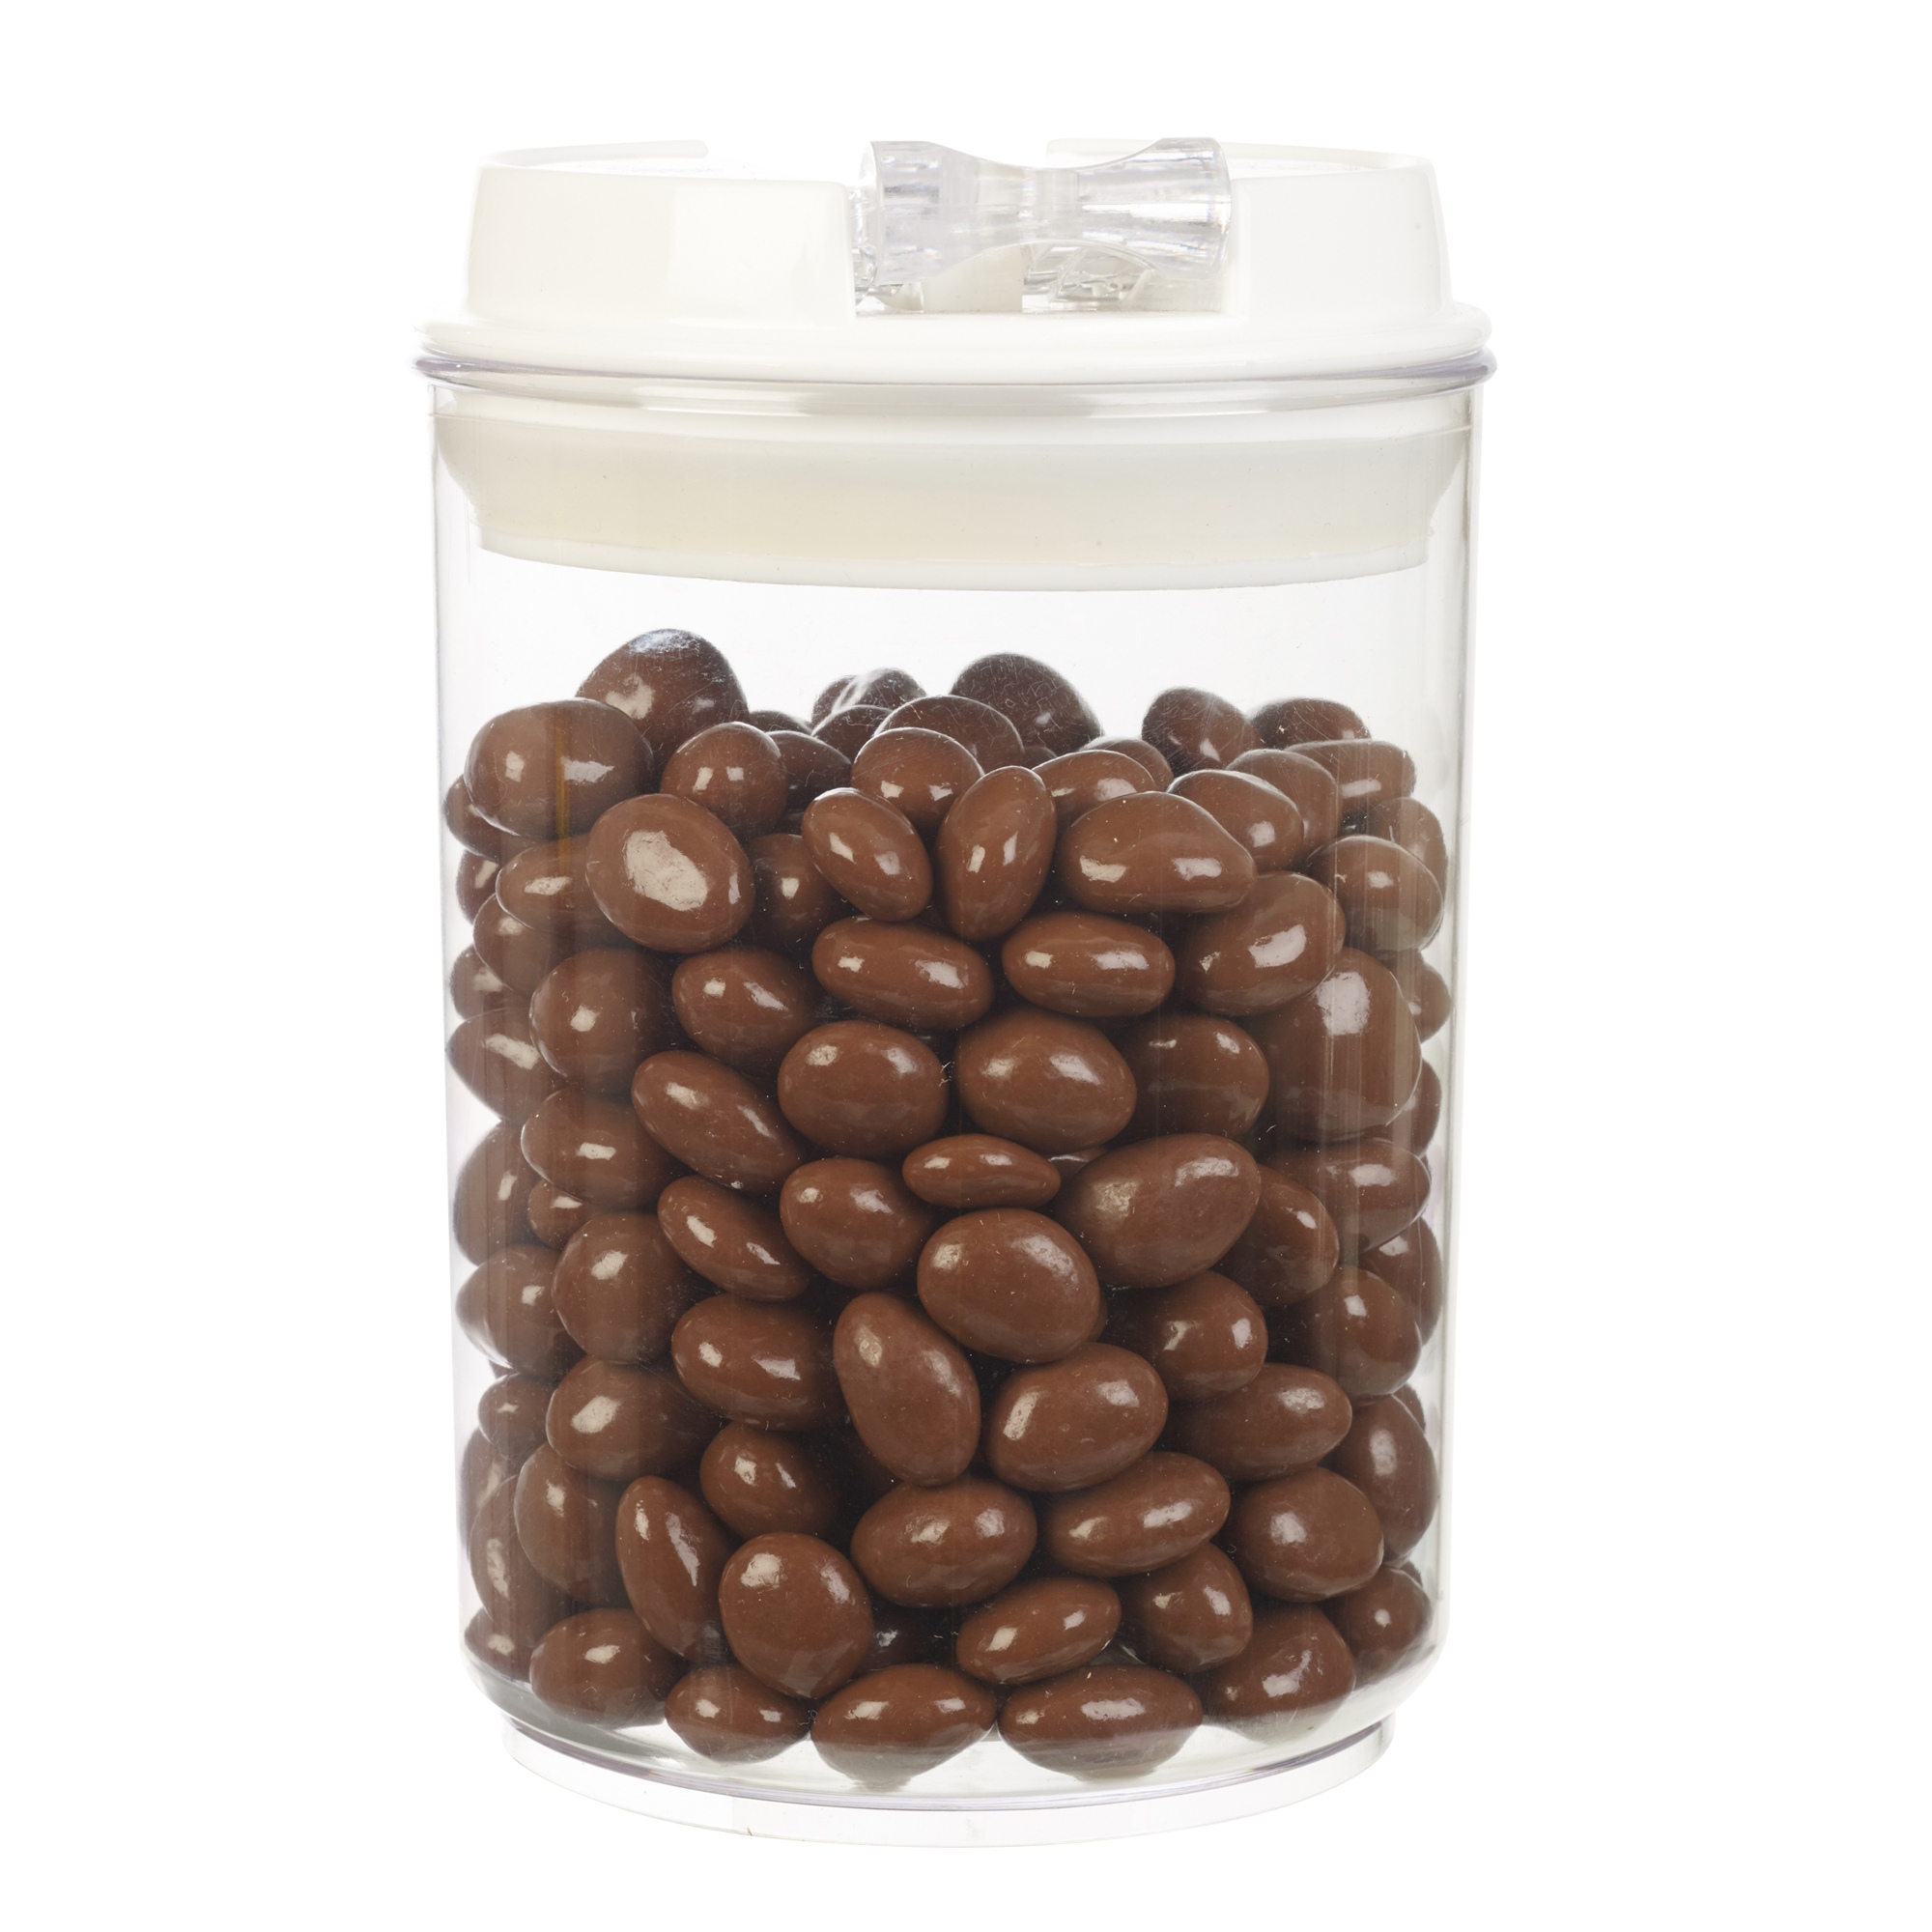 item specifics medium wilko airtight seal clamp lid kitchen food storage      rh   ebay co uk